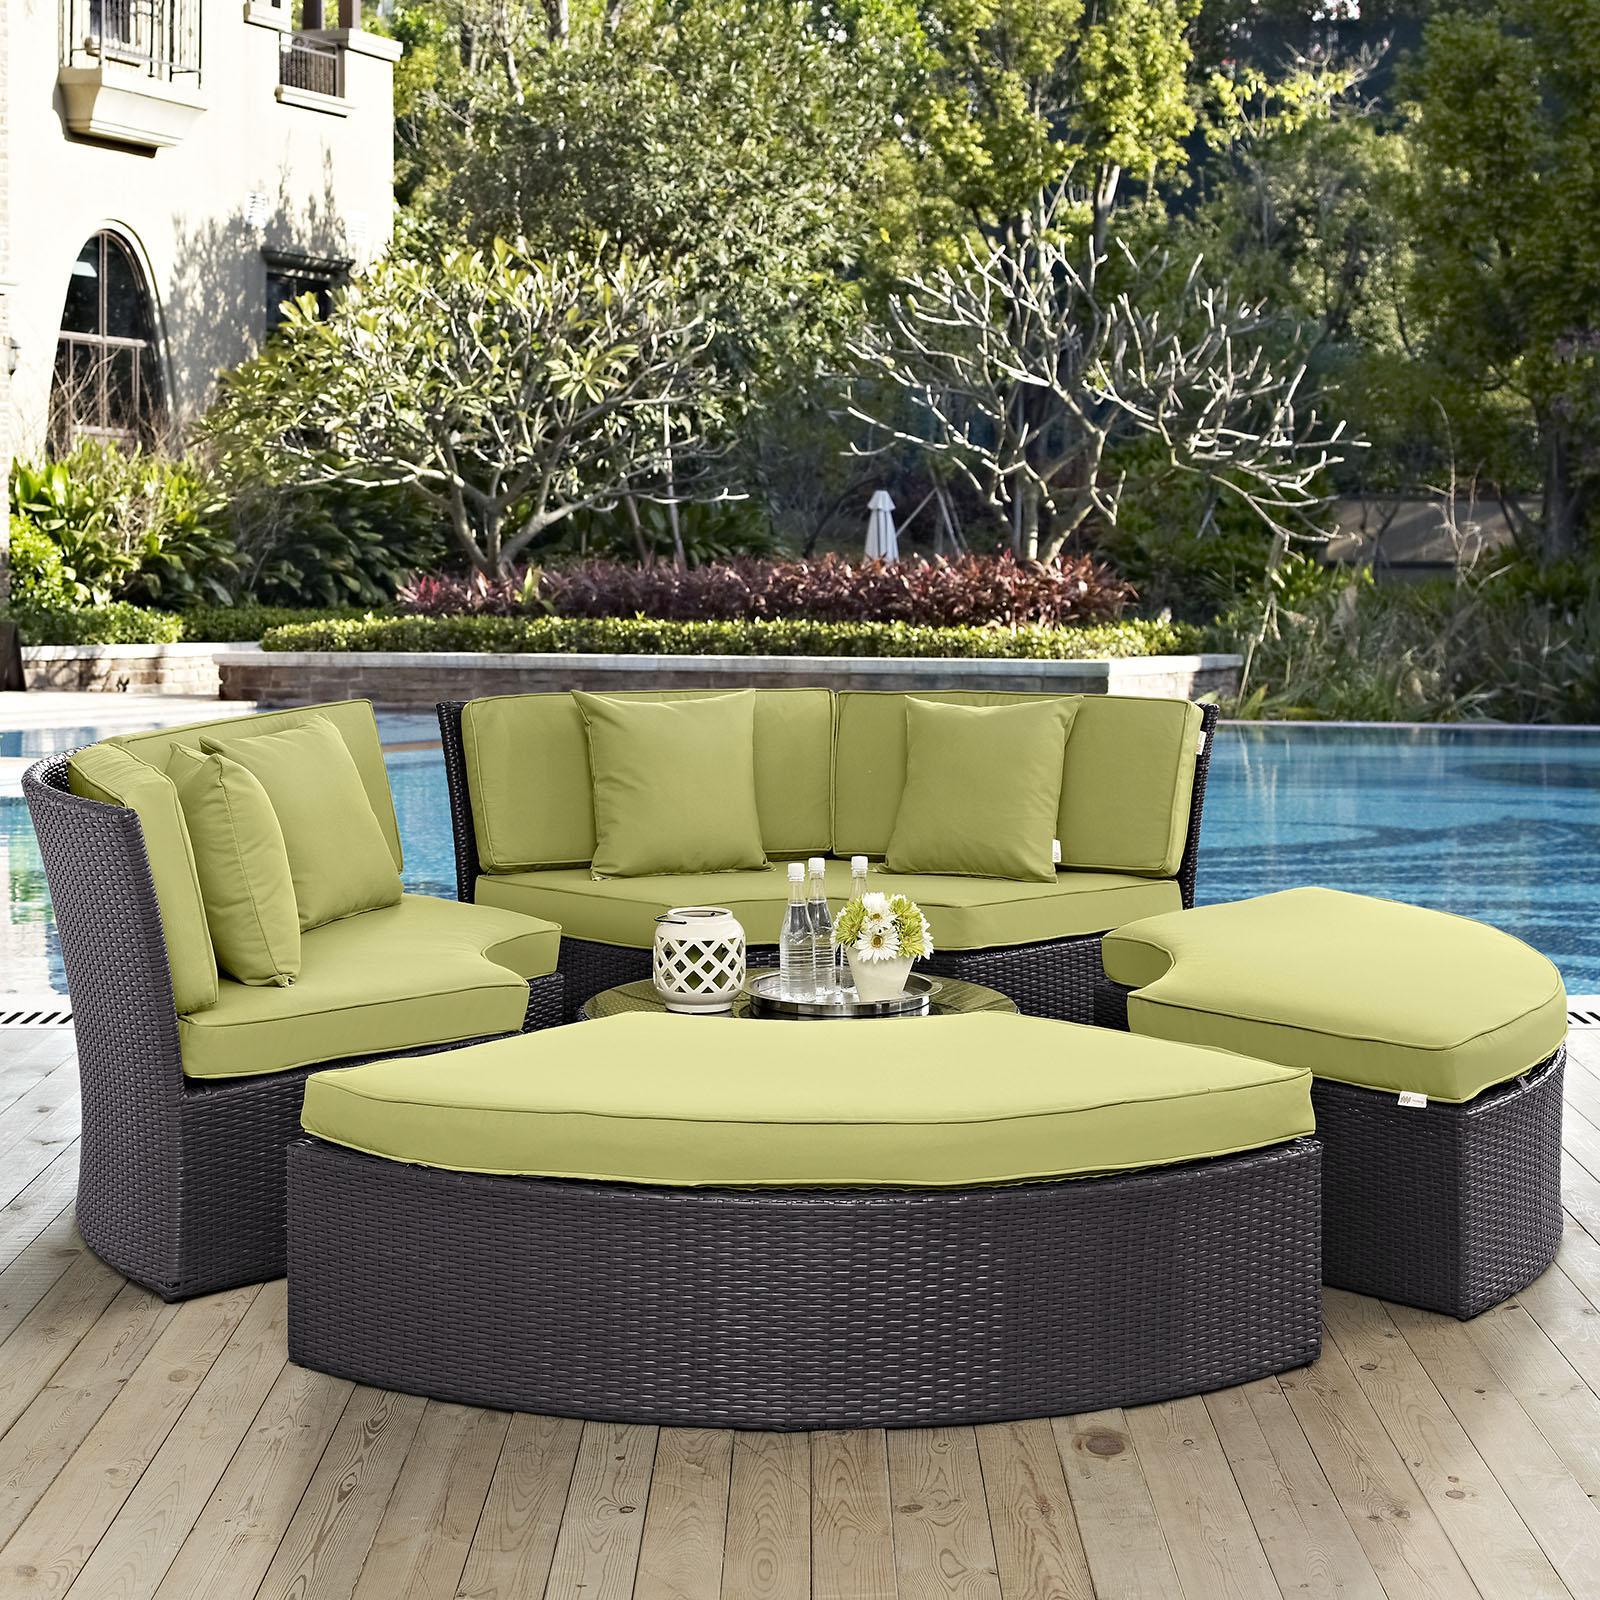 circular outdoor patio daybed set eei 2171 discontinued